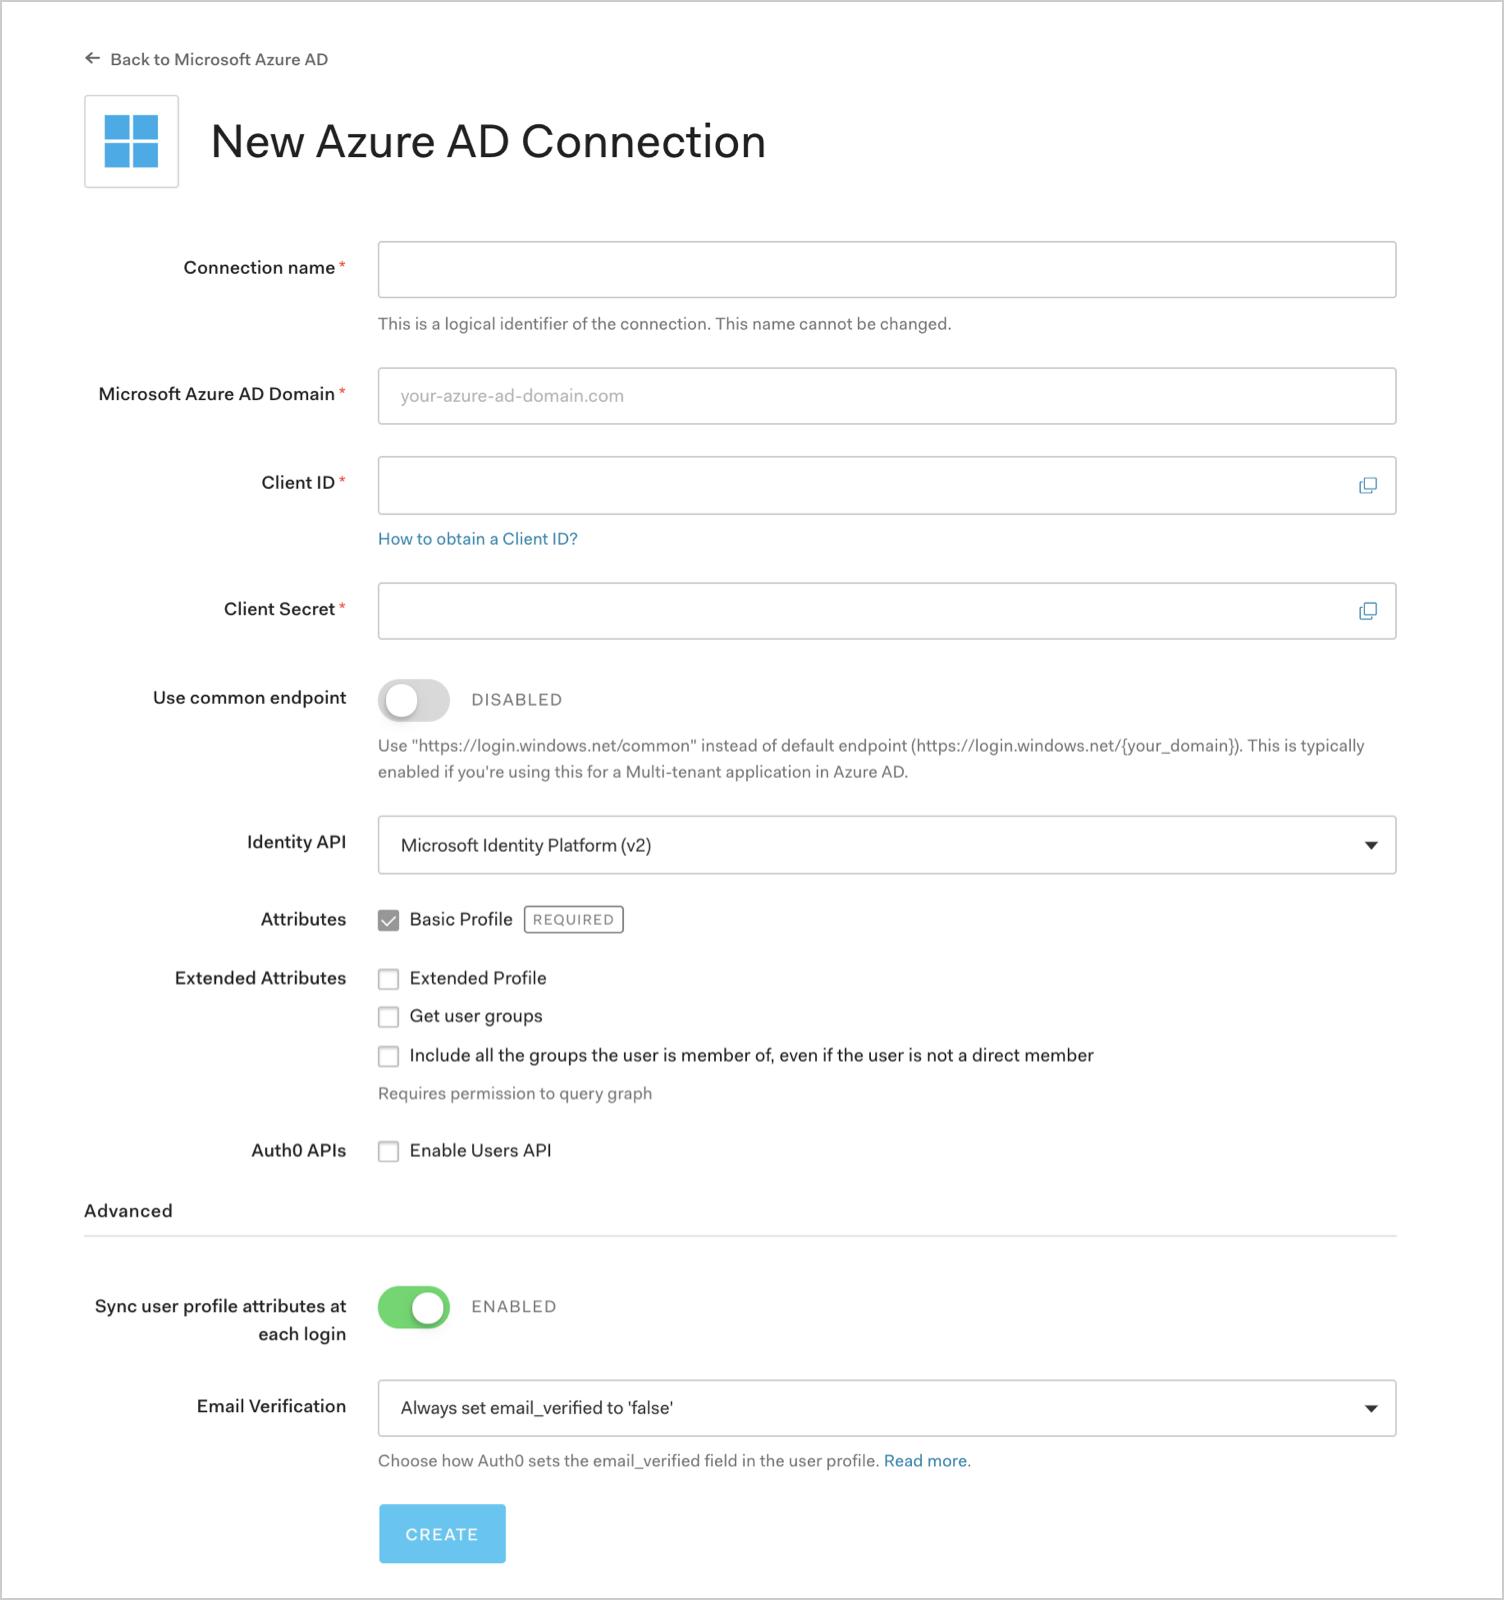 Configure General Microsoft Azure AD Settings